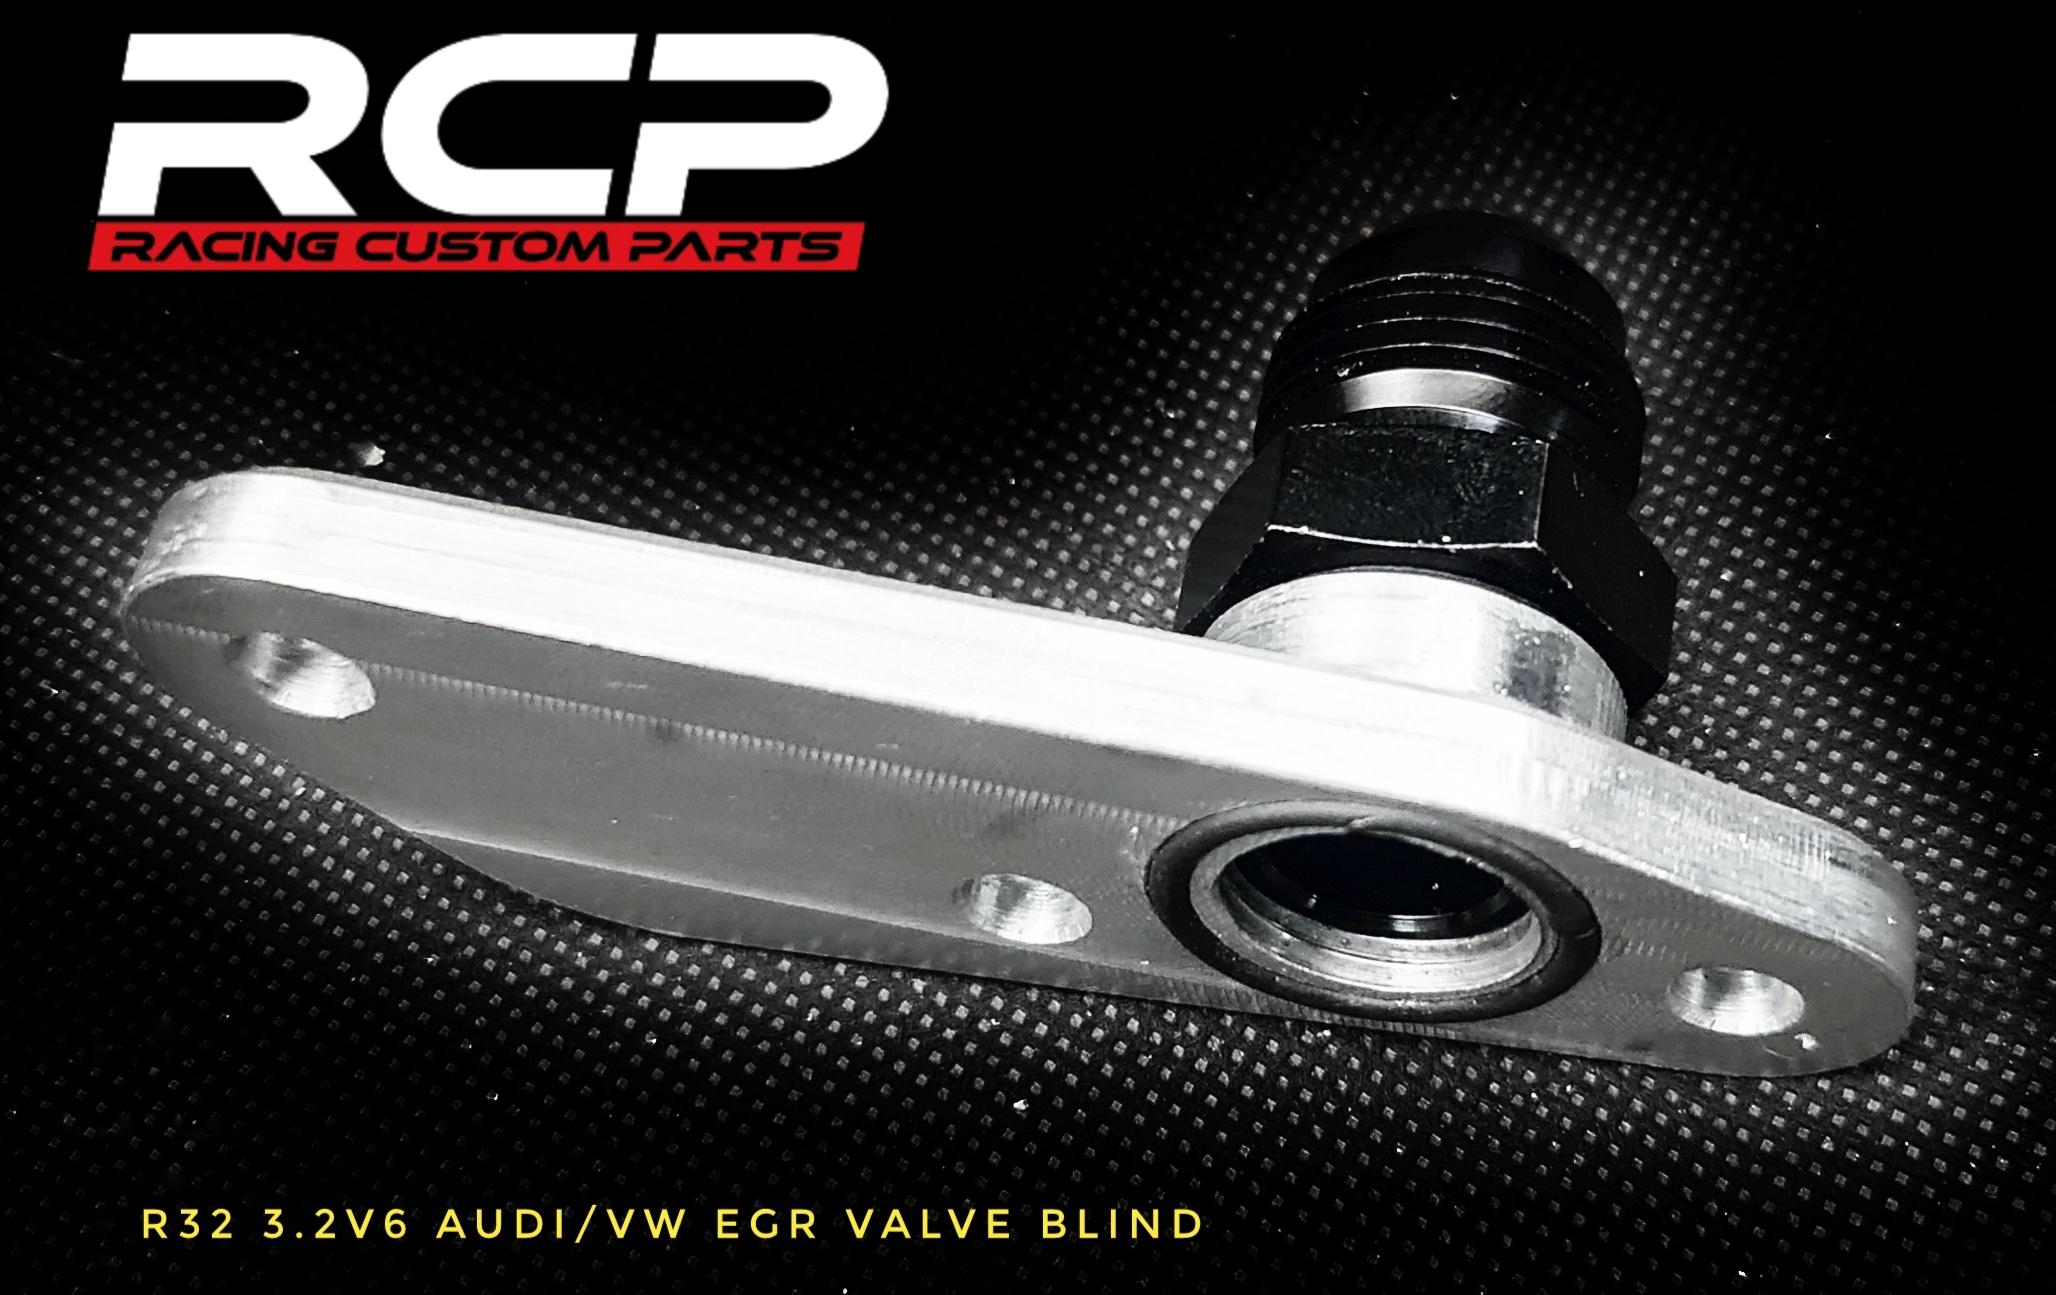 r32 audi vw turbo egr valve blind racing custom parts billet cnc